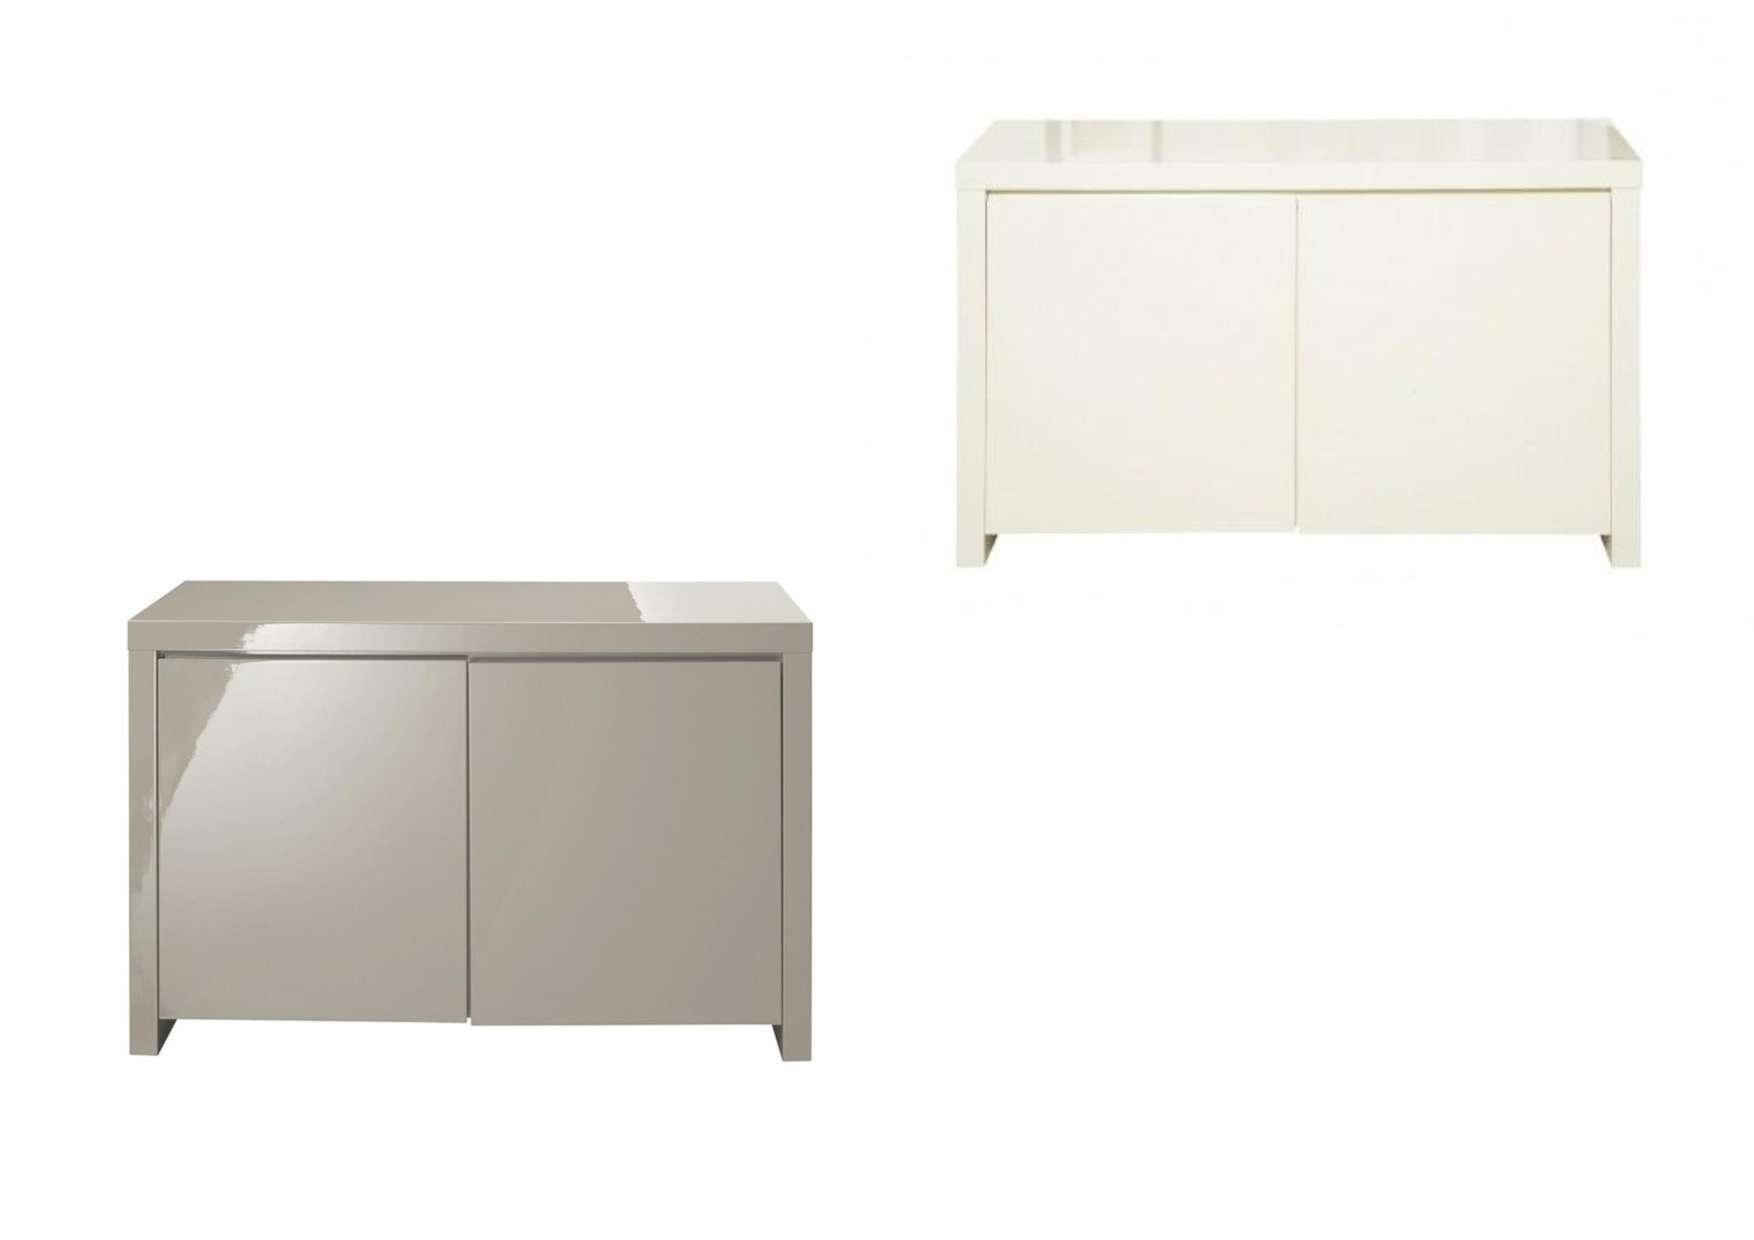 High Gloss Cream Or Stone 2 Door Sideboard Within High Gloss Cream Sideboards (Gallery 12 of 20)